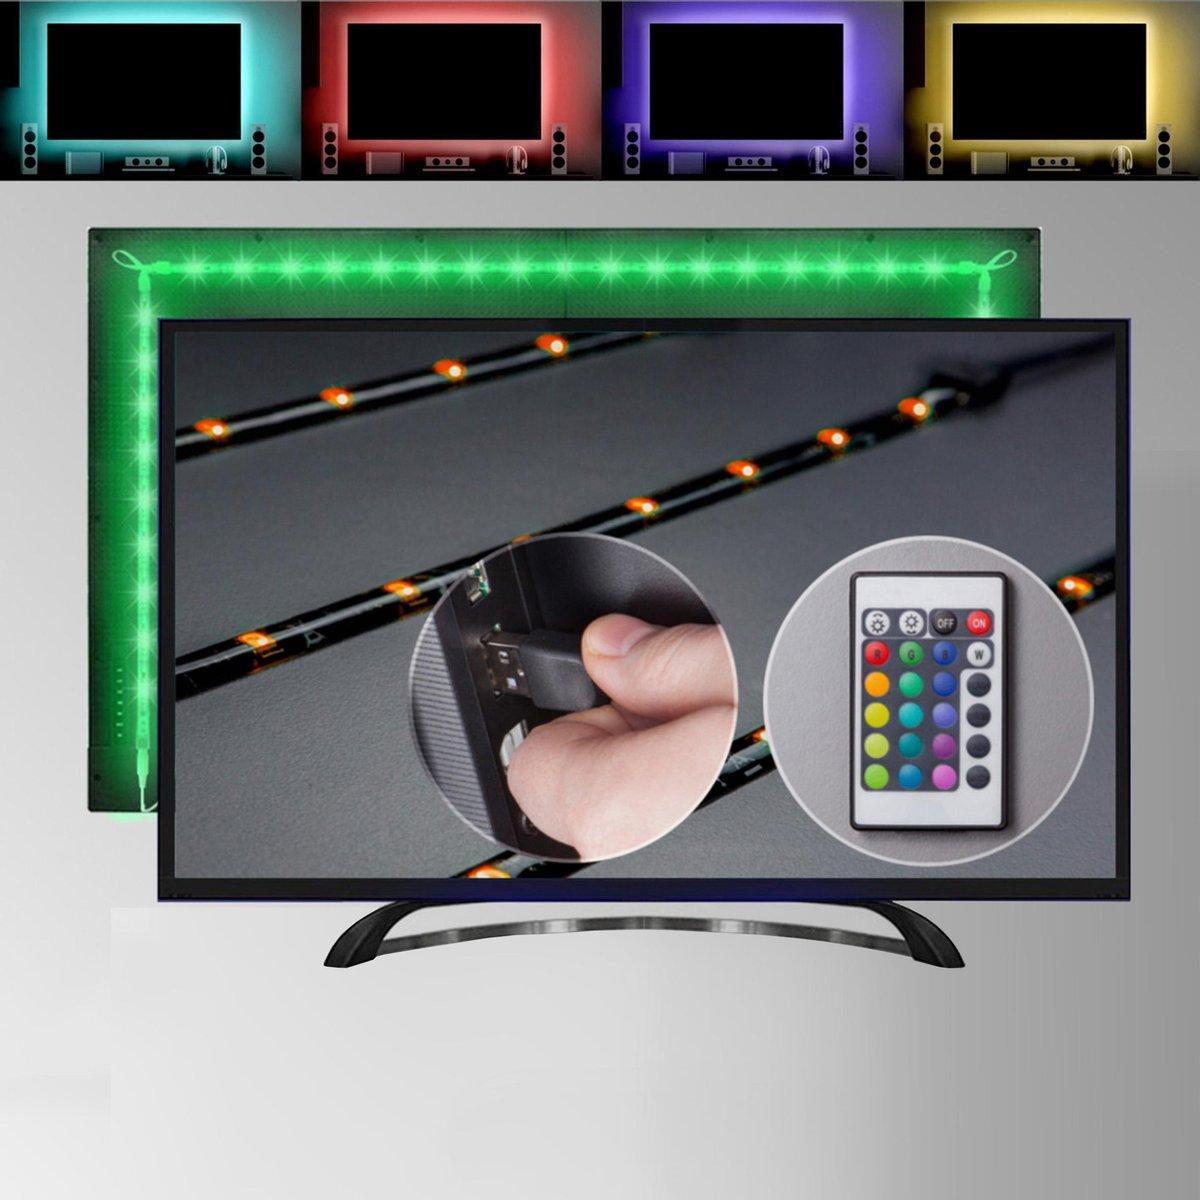 B.K.Licht - LED Strip - 2 meter - RGB - voor TV/PC - USB-aansluiting - incl. afstandsbediening - zelfklevend